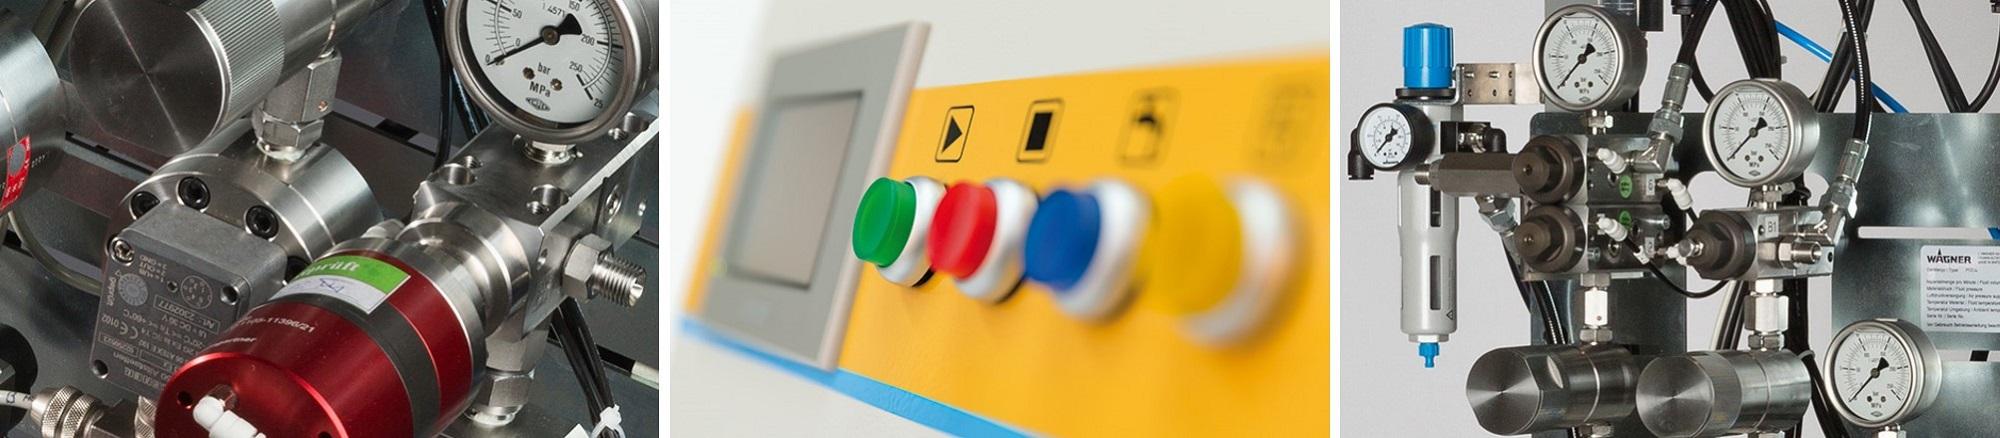 Yorkshire Spray Services Ltd - Wagner FlexControl Smart Detail